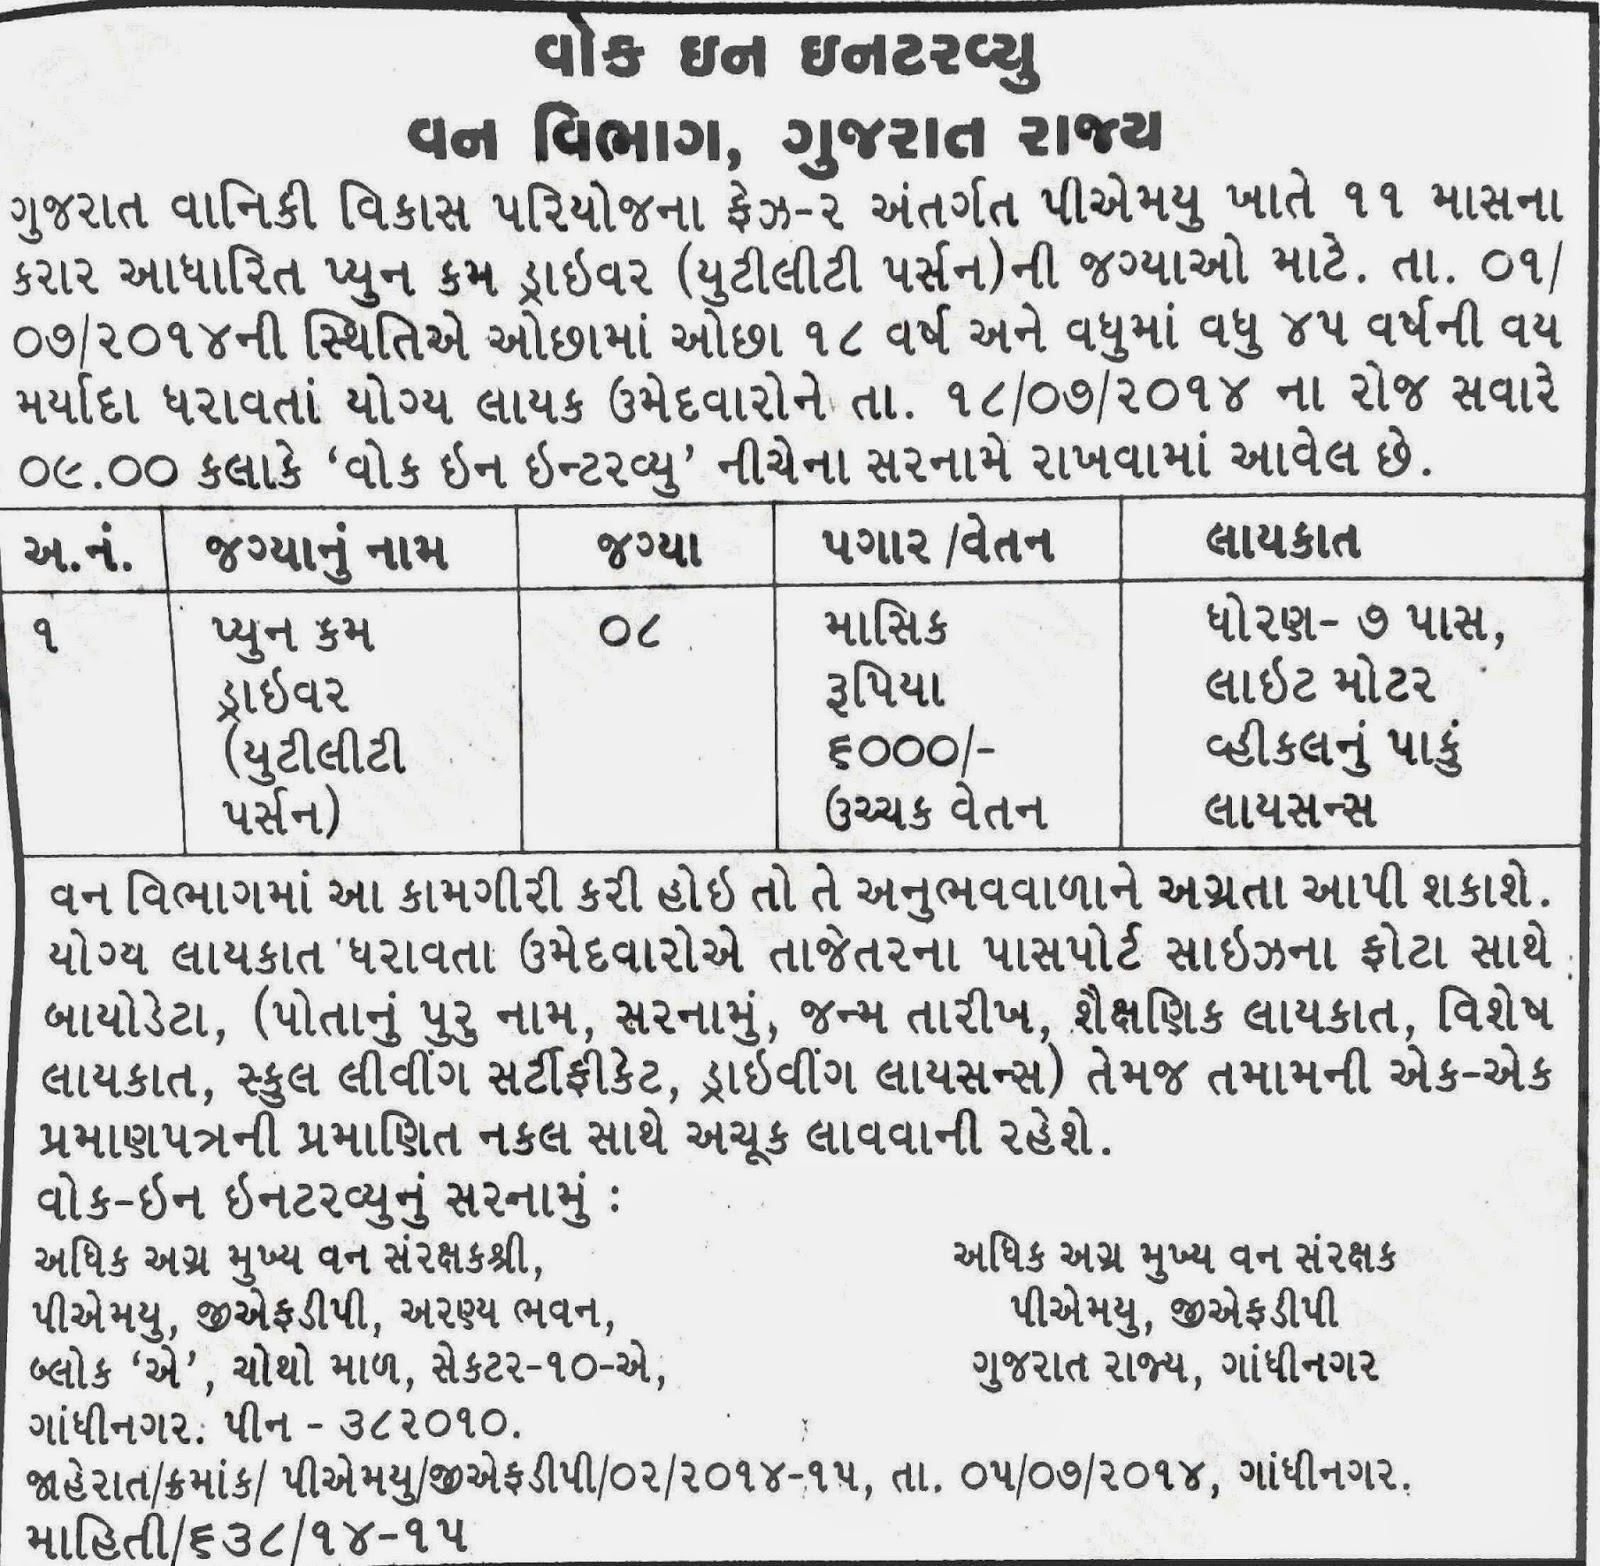 Gujarat Forestry Development Project (GFDP) Peon cum